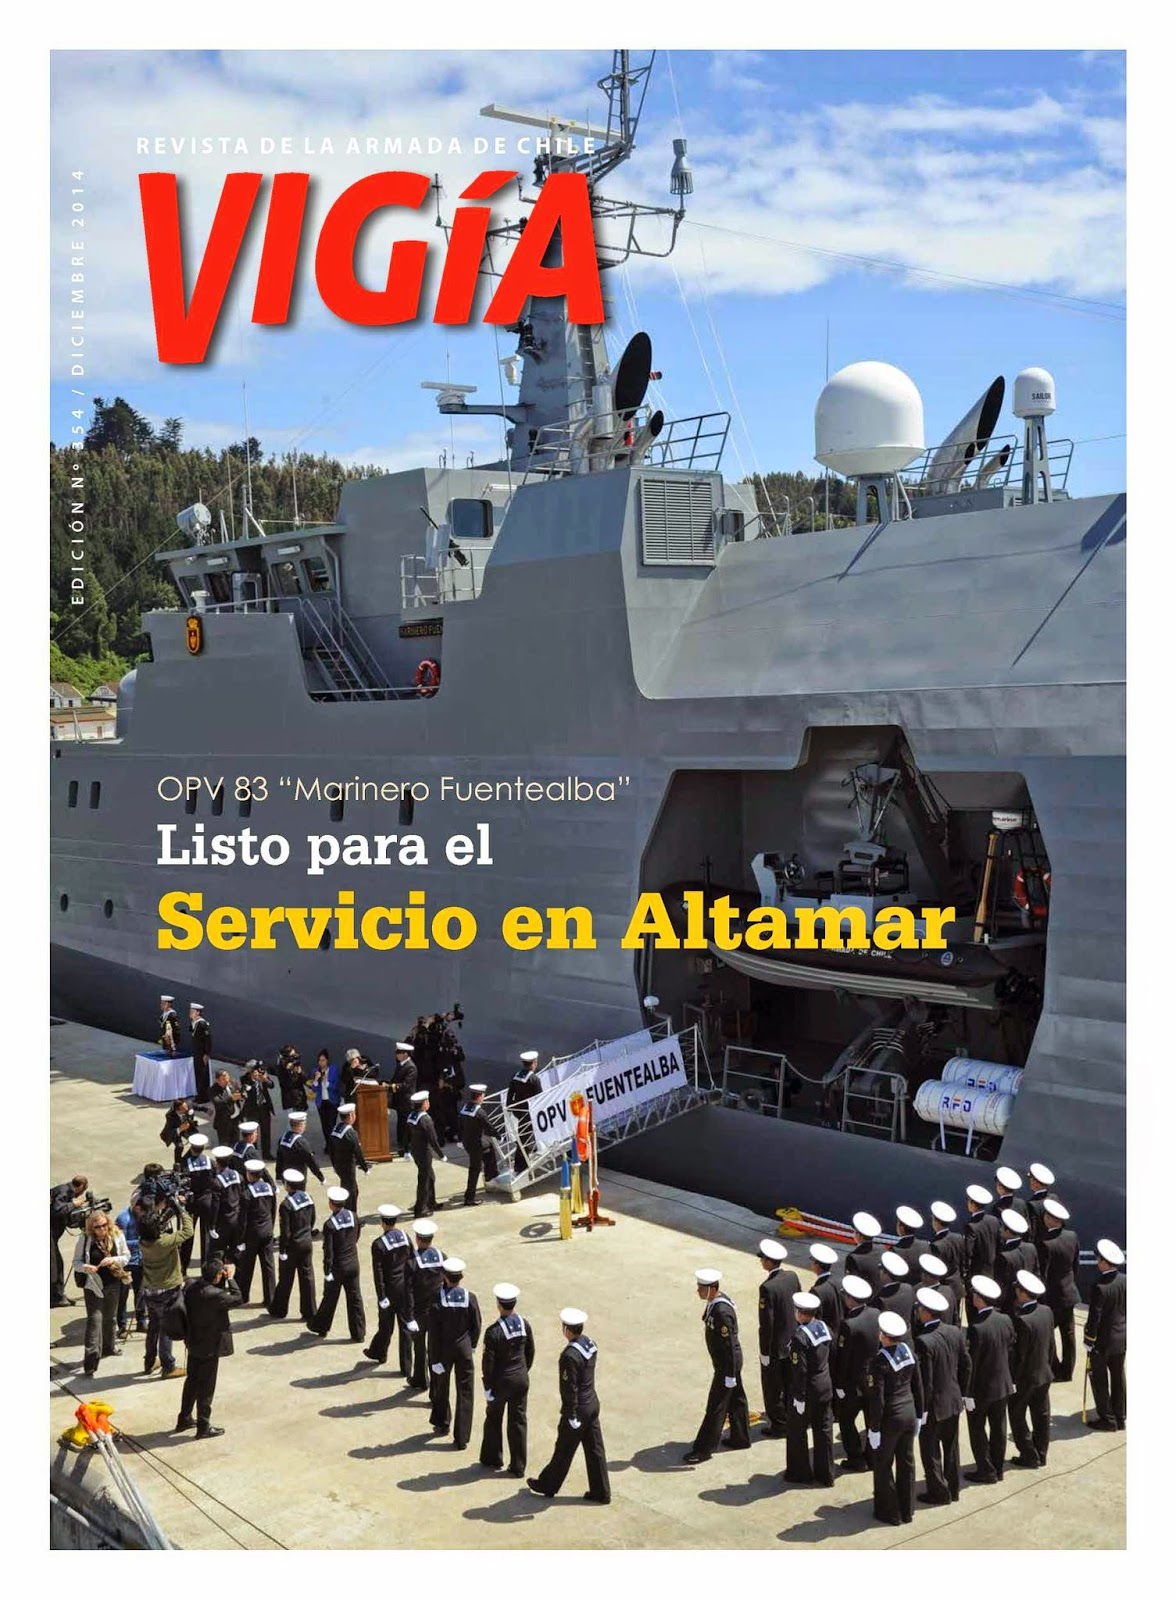 http://www.revistavigia.cl/papeldigital/indice.html?dr=revistavigia&edic=20141210&mp=36